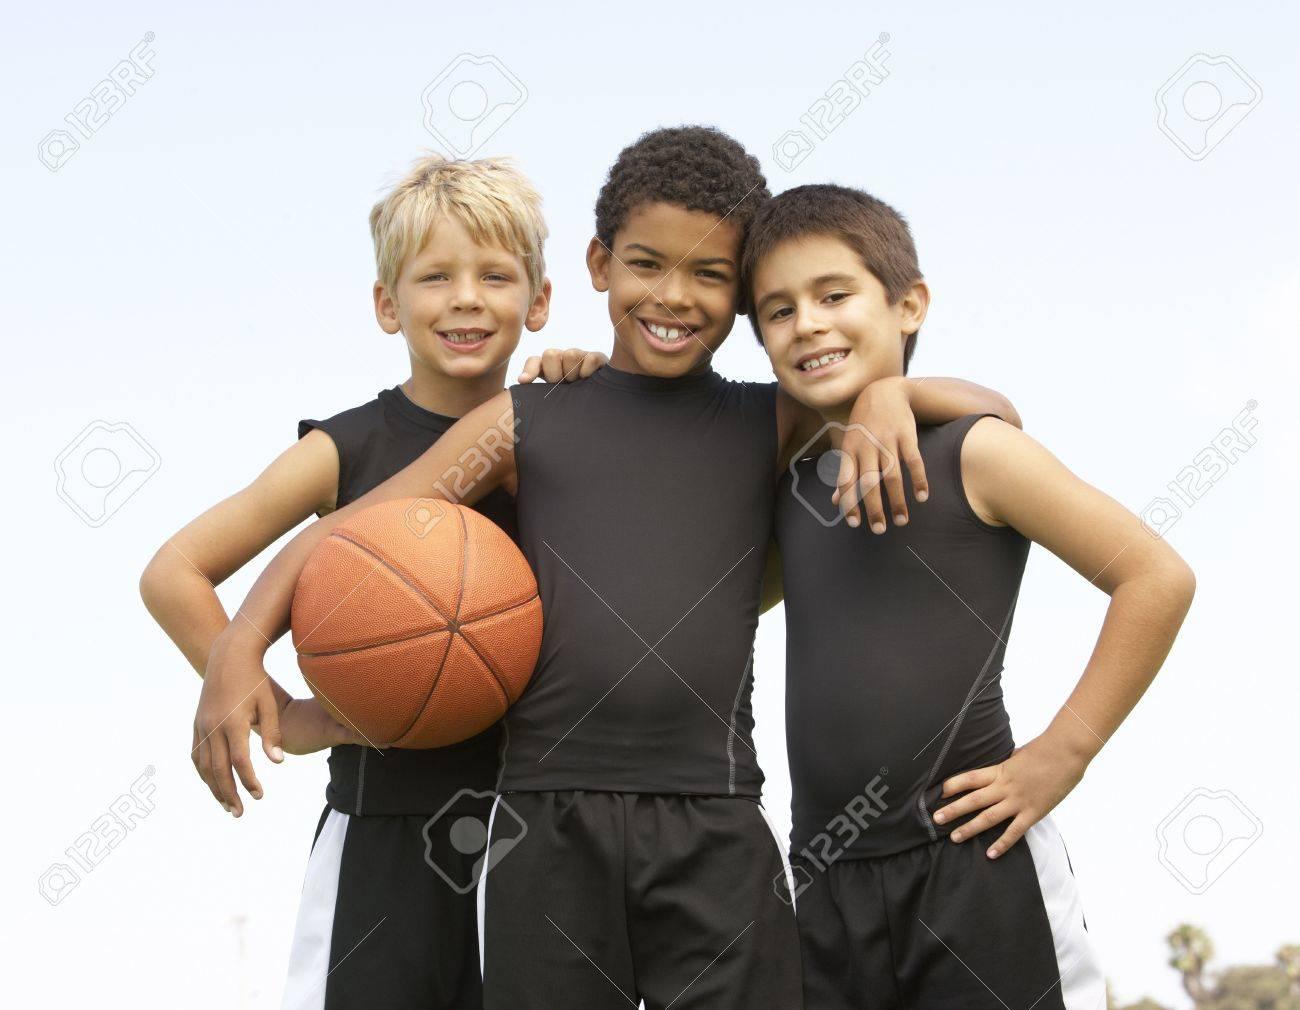 Young Boy Playing Basketball Stock Photo - 6453700